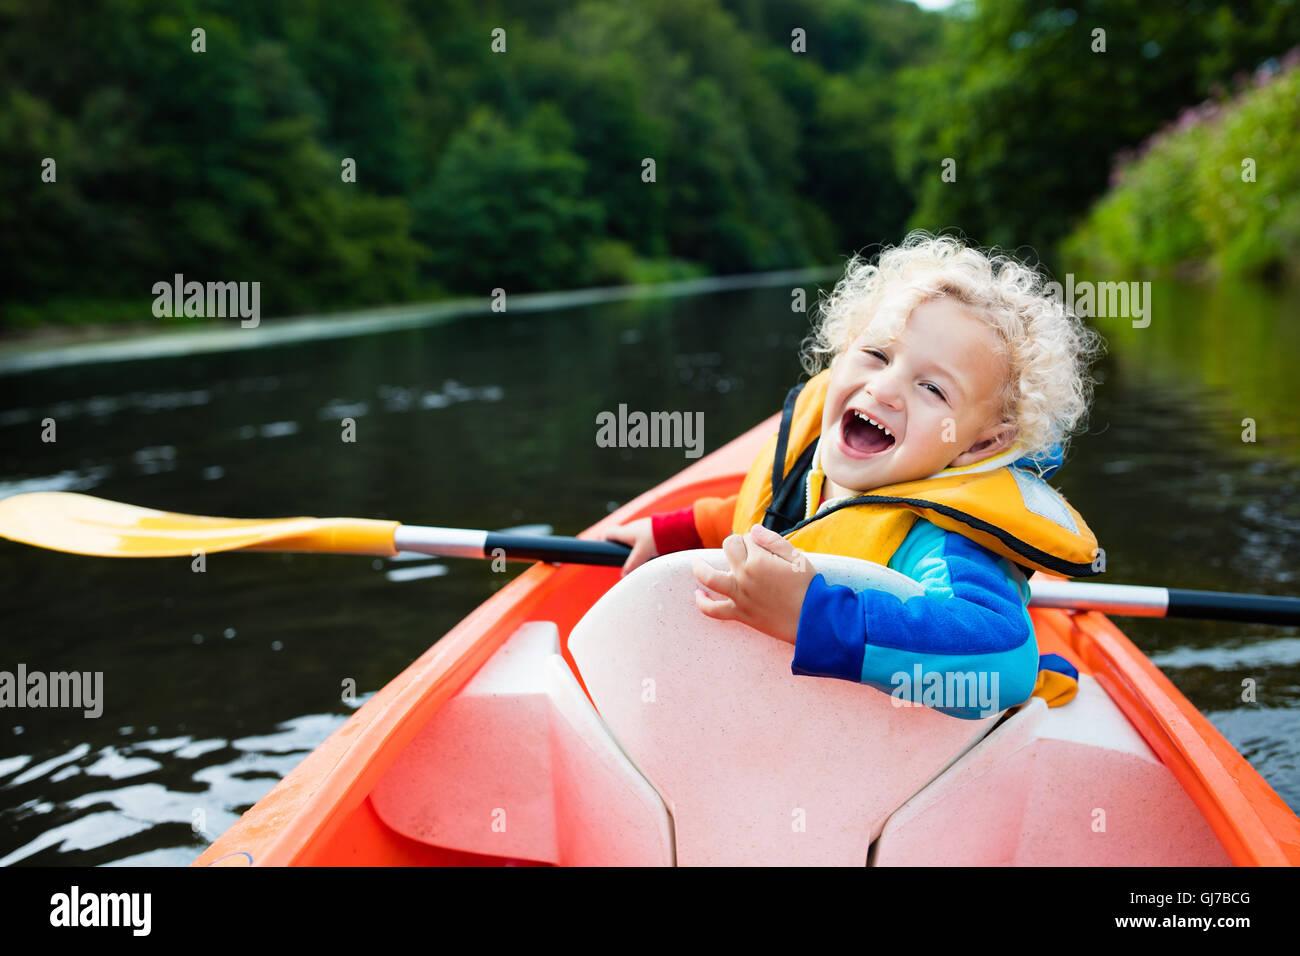 Capretto felice godendo kayak giro sul bellissimo fiume. Piccola parentesi toddler boy kayak su caldo giorno d'estate. Immagini Stock